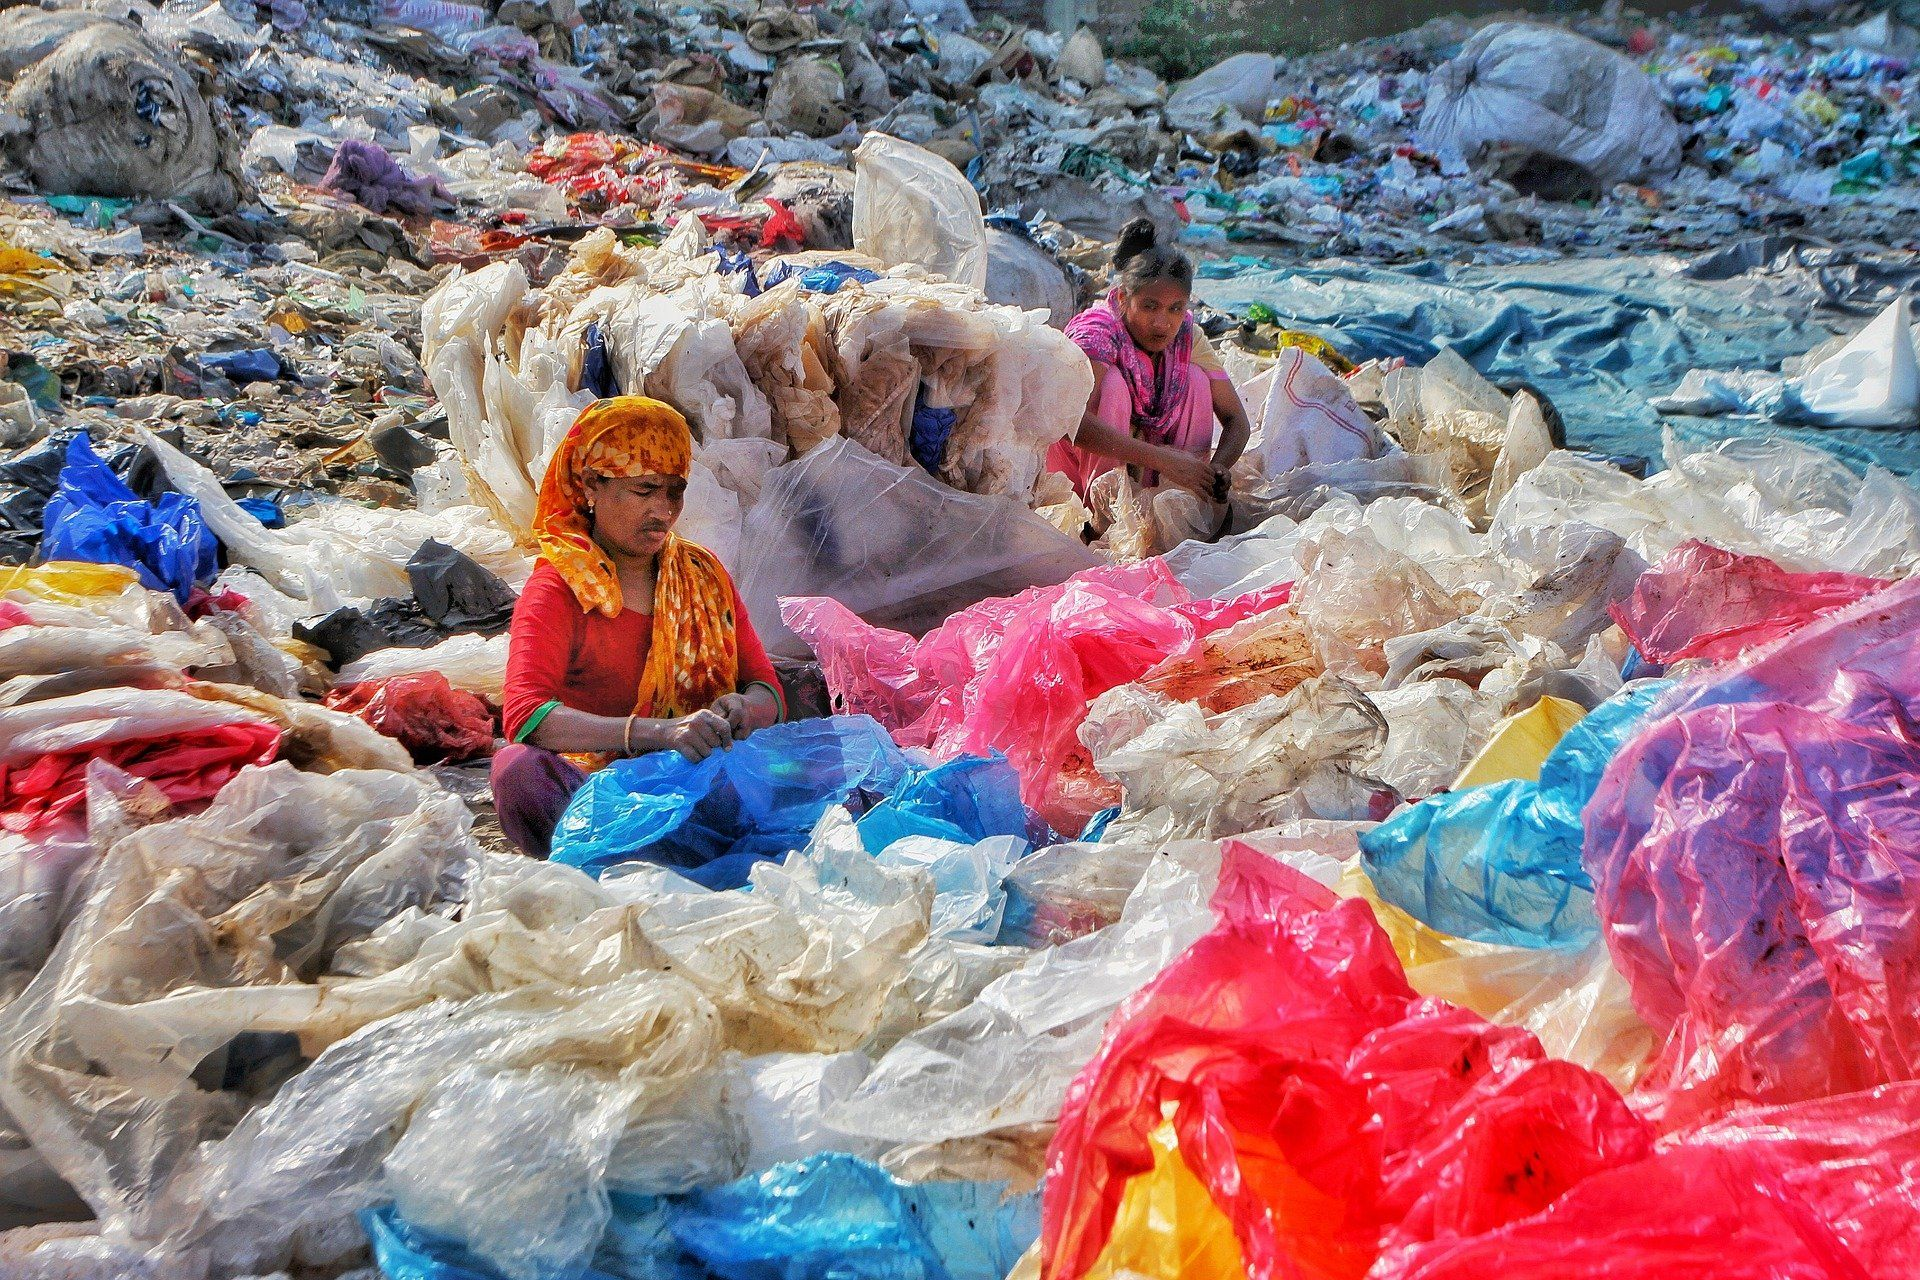 Forscher: Plastikmüll muss gestoppt werden